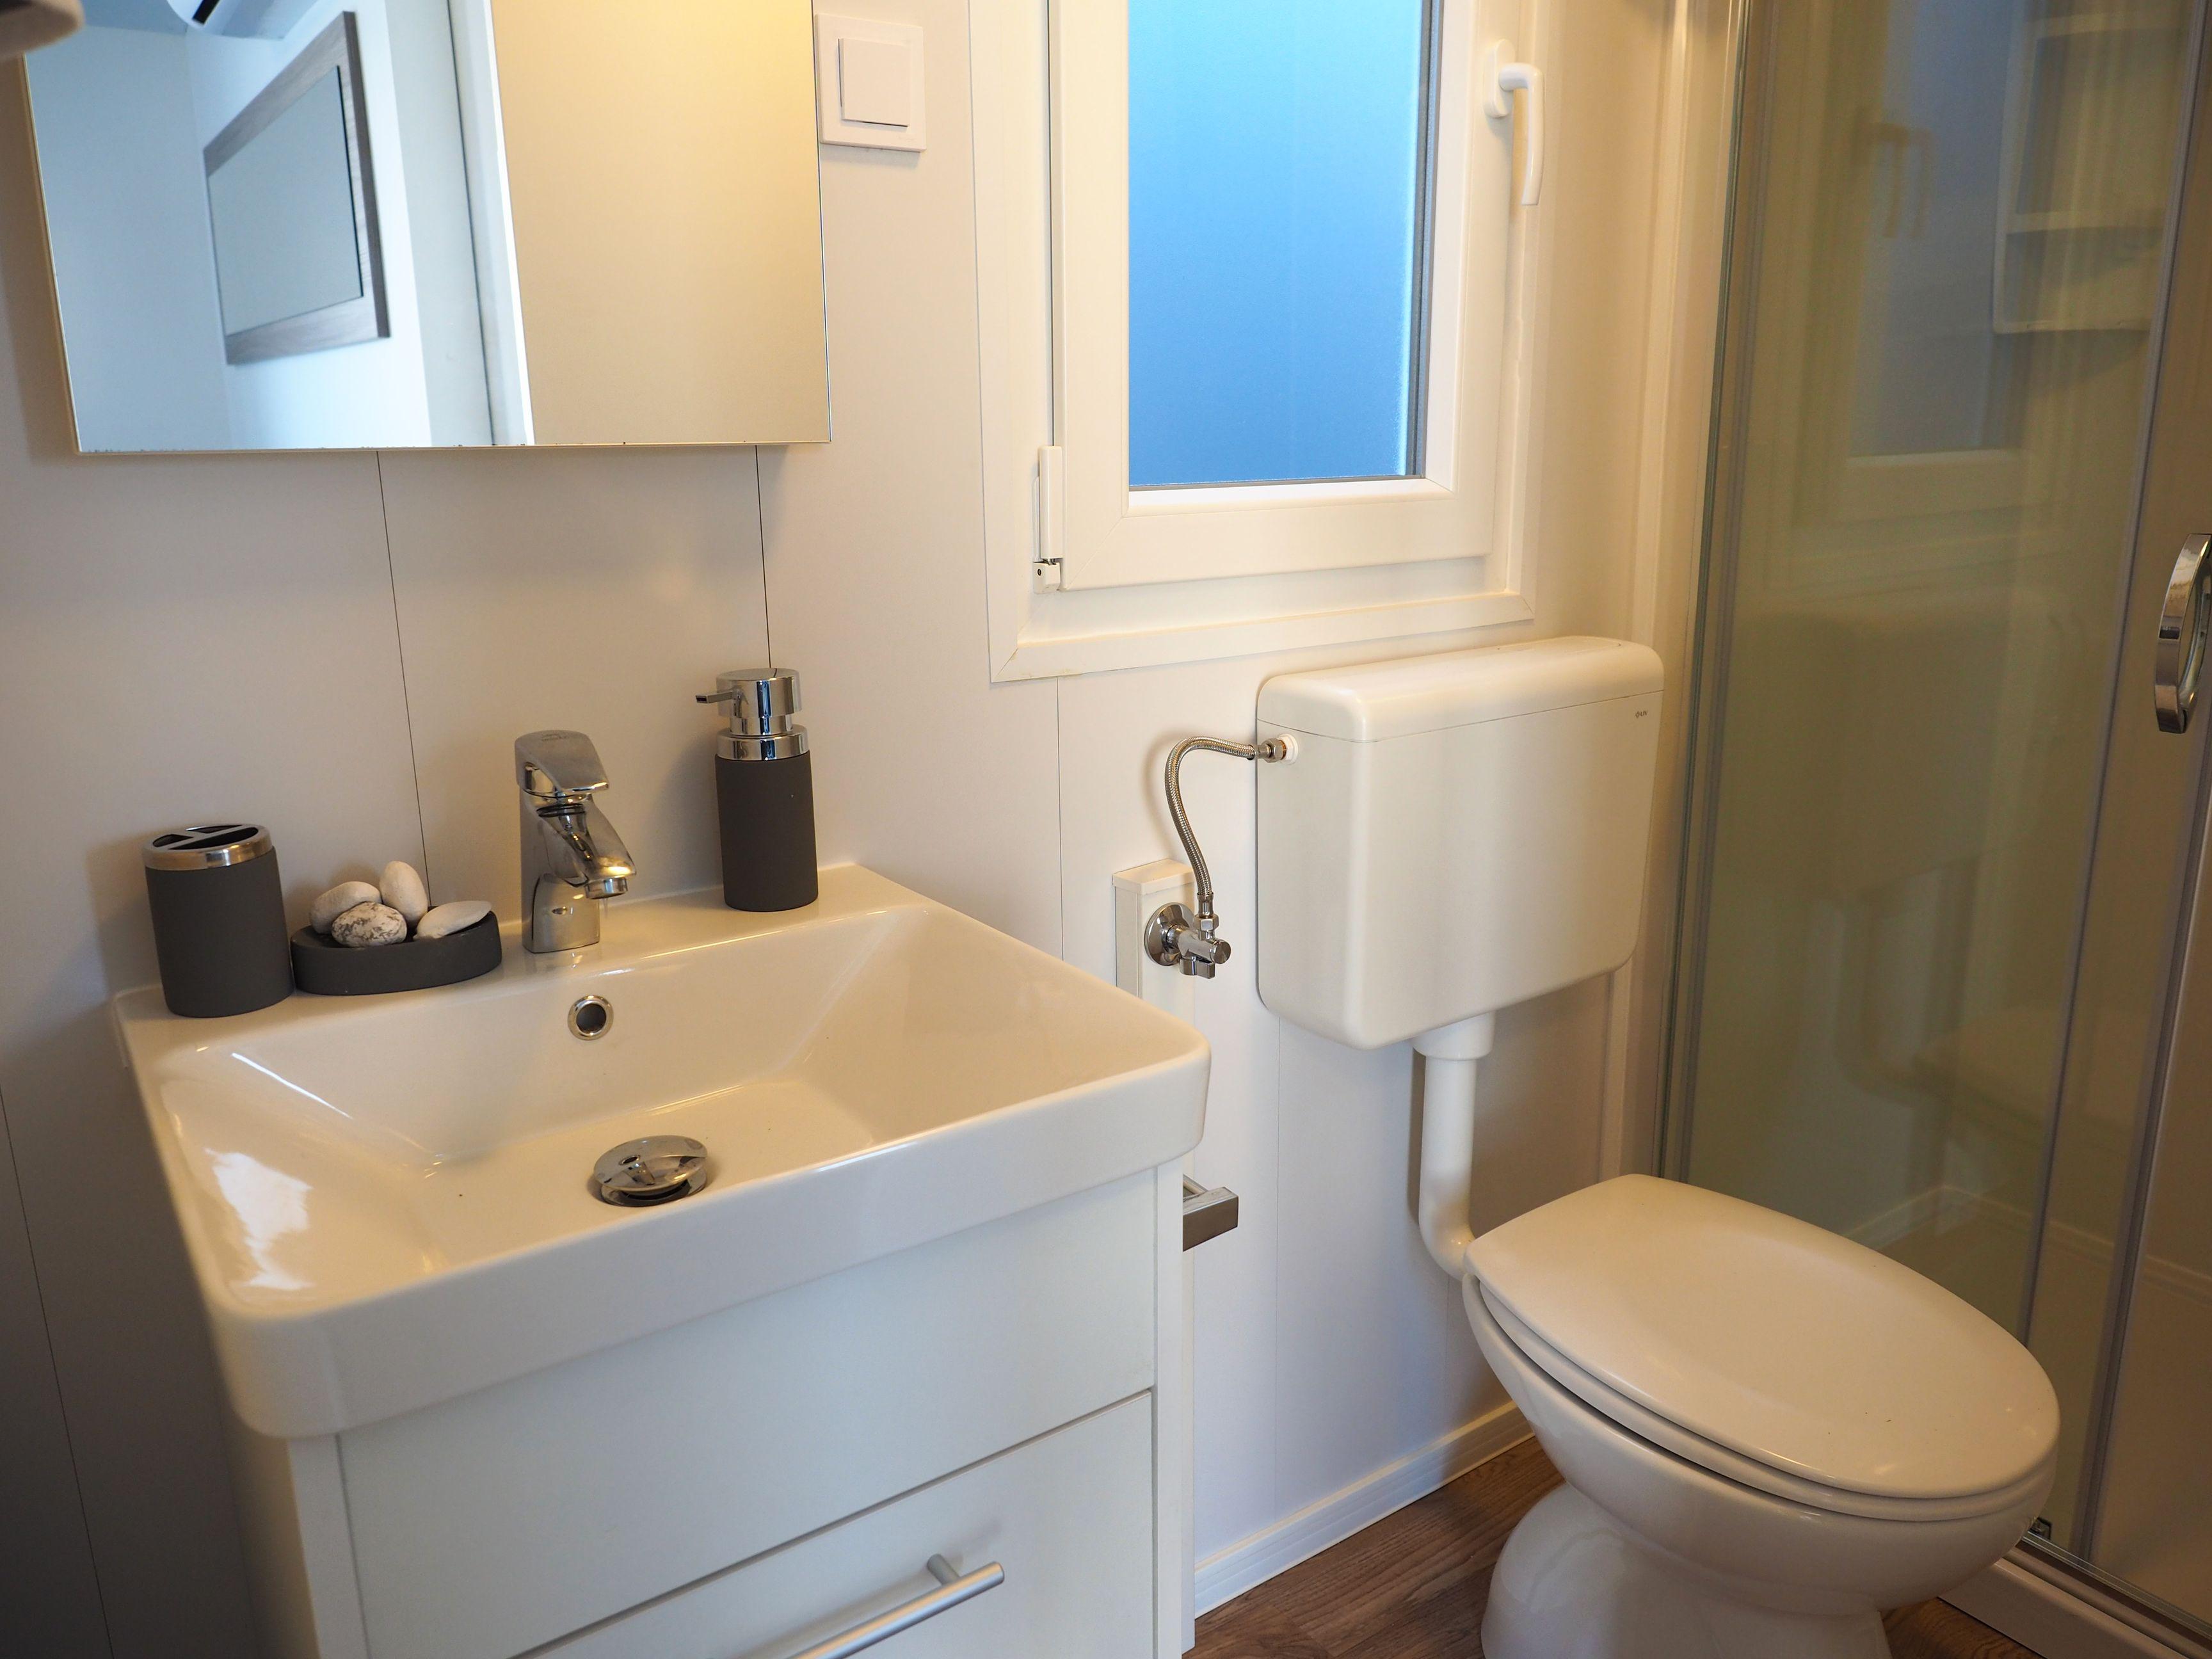 Glampingunterkunft: Badezimmer Mobilheim Mediterran Comfort Family  Meerblick   Mobilheim Mediterran Comfort Family Mit Meerblick Von